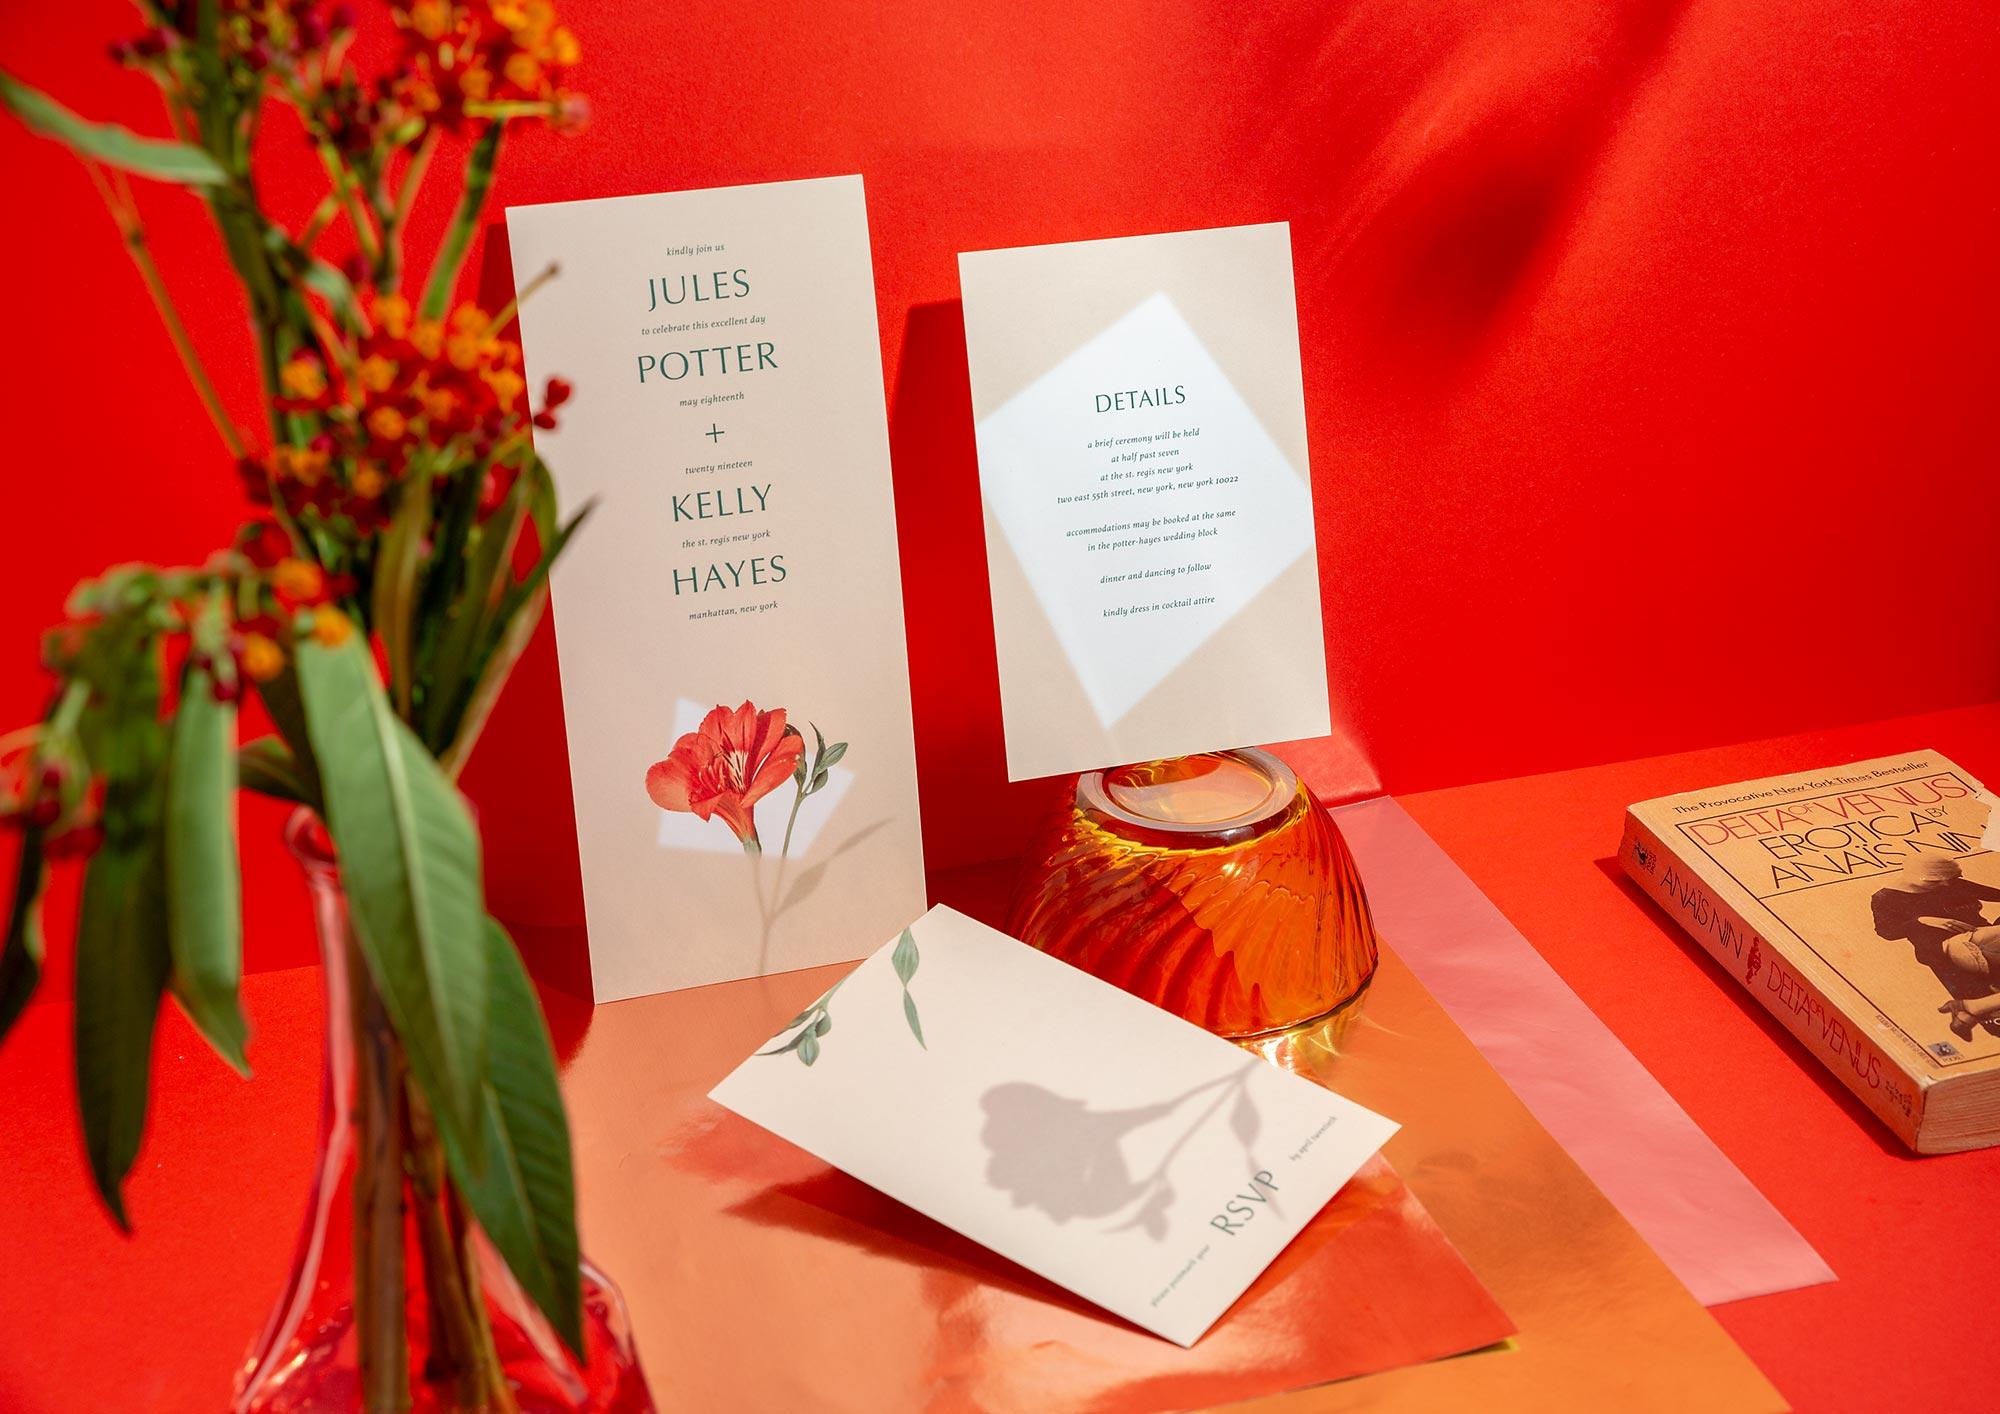 Flor gender-inclusive wedding invitation design by eco-friendly paper goods studio ephemora